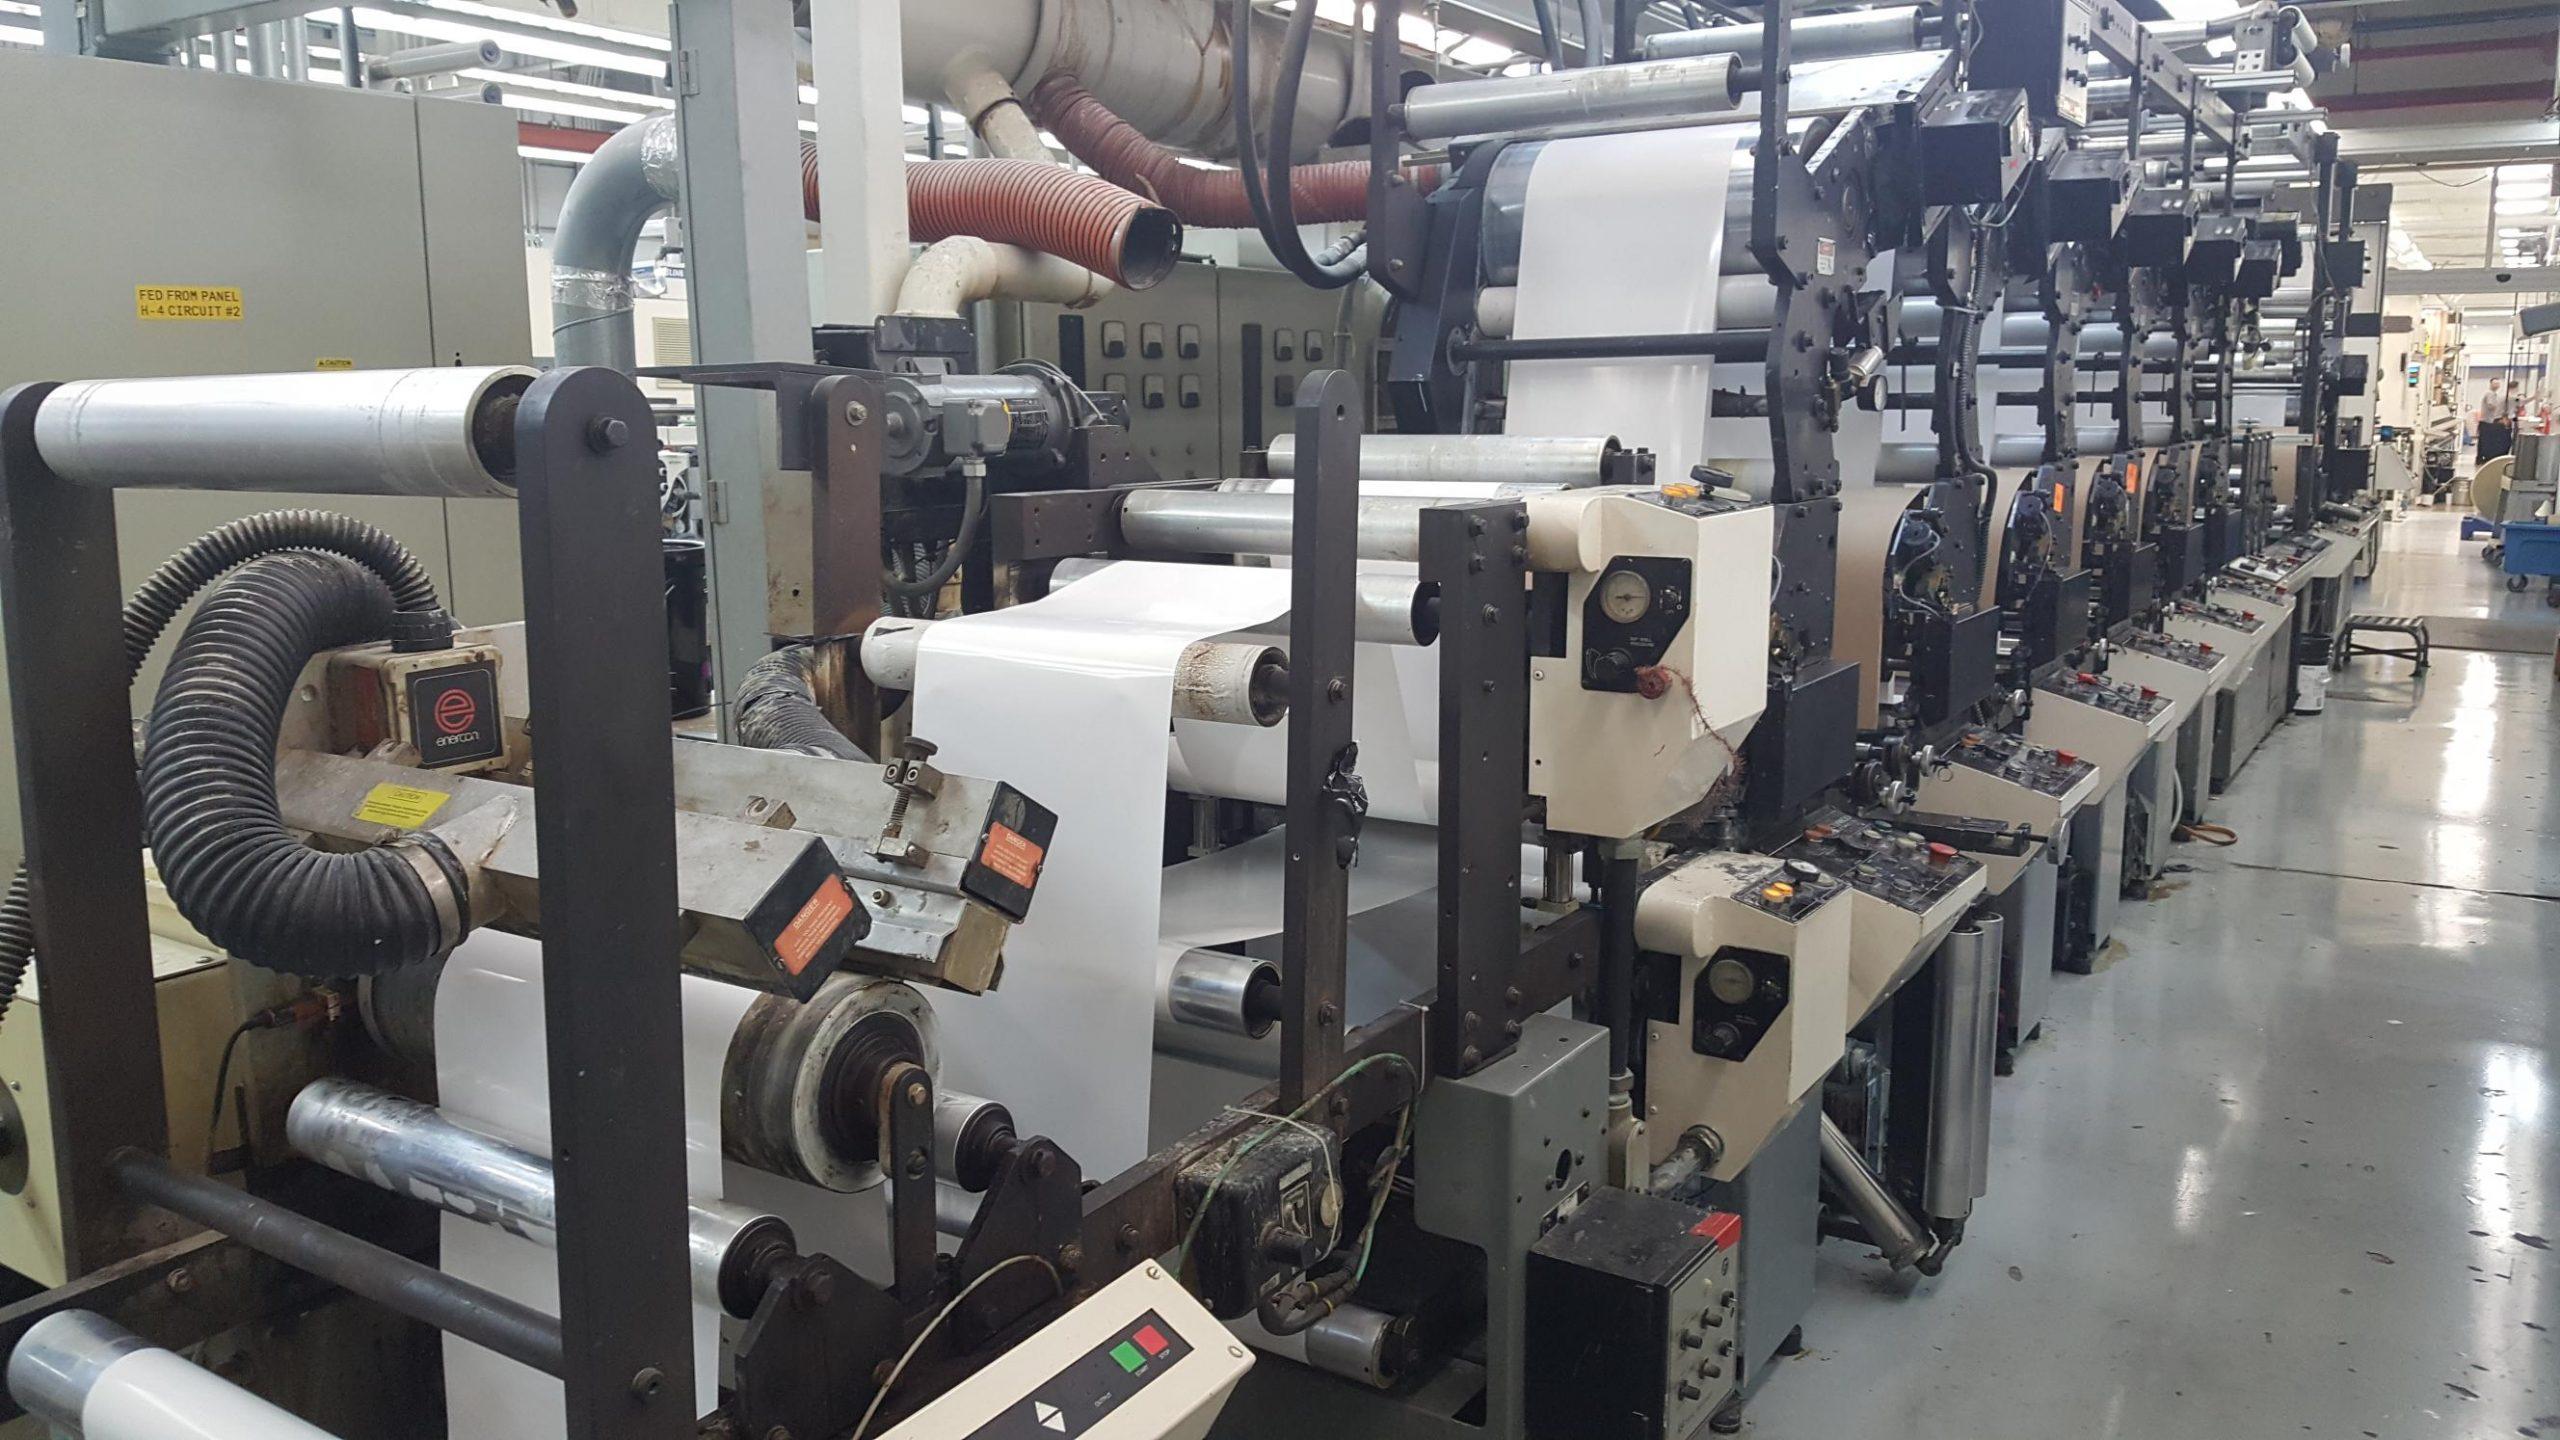 Comco ProGlide - Used Flexo Printing Presses and Used Flexographic Equipment-6